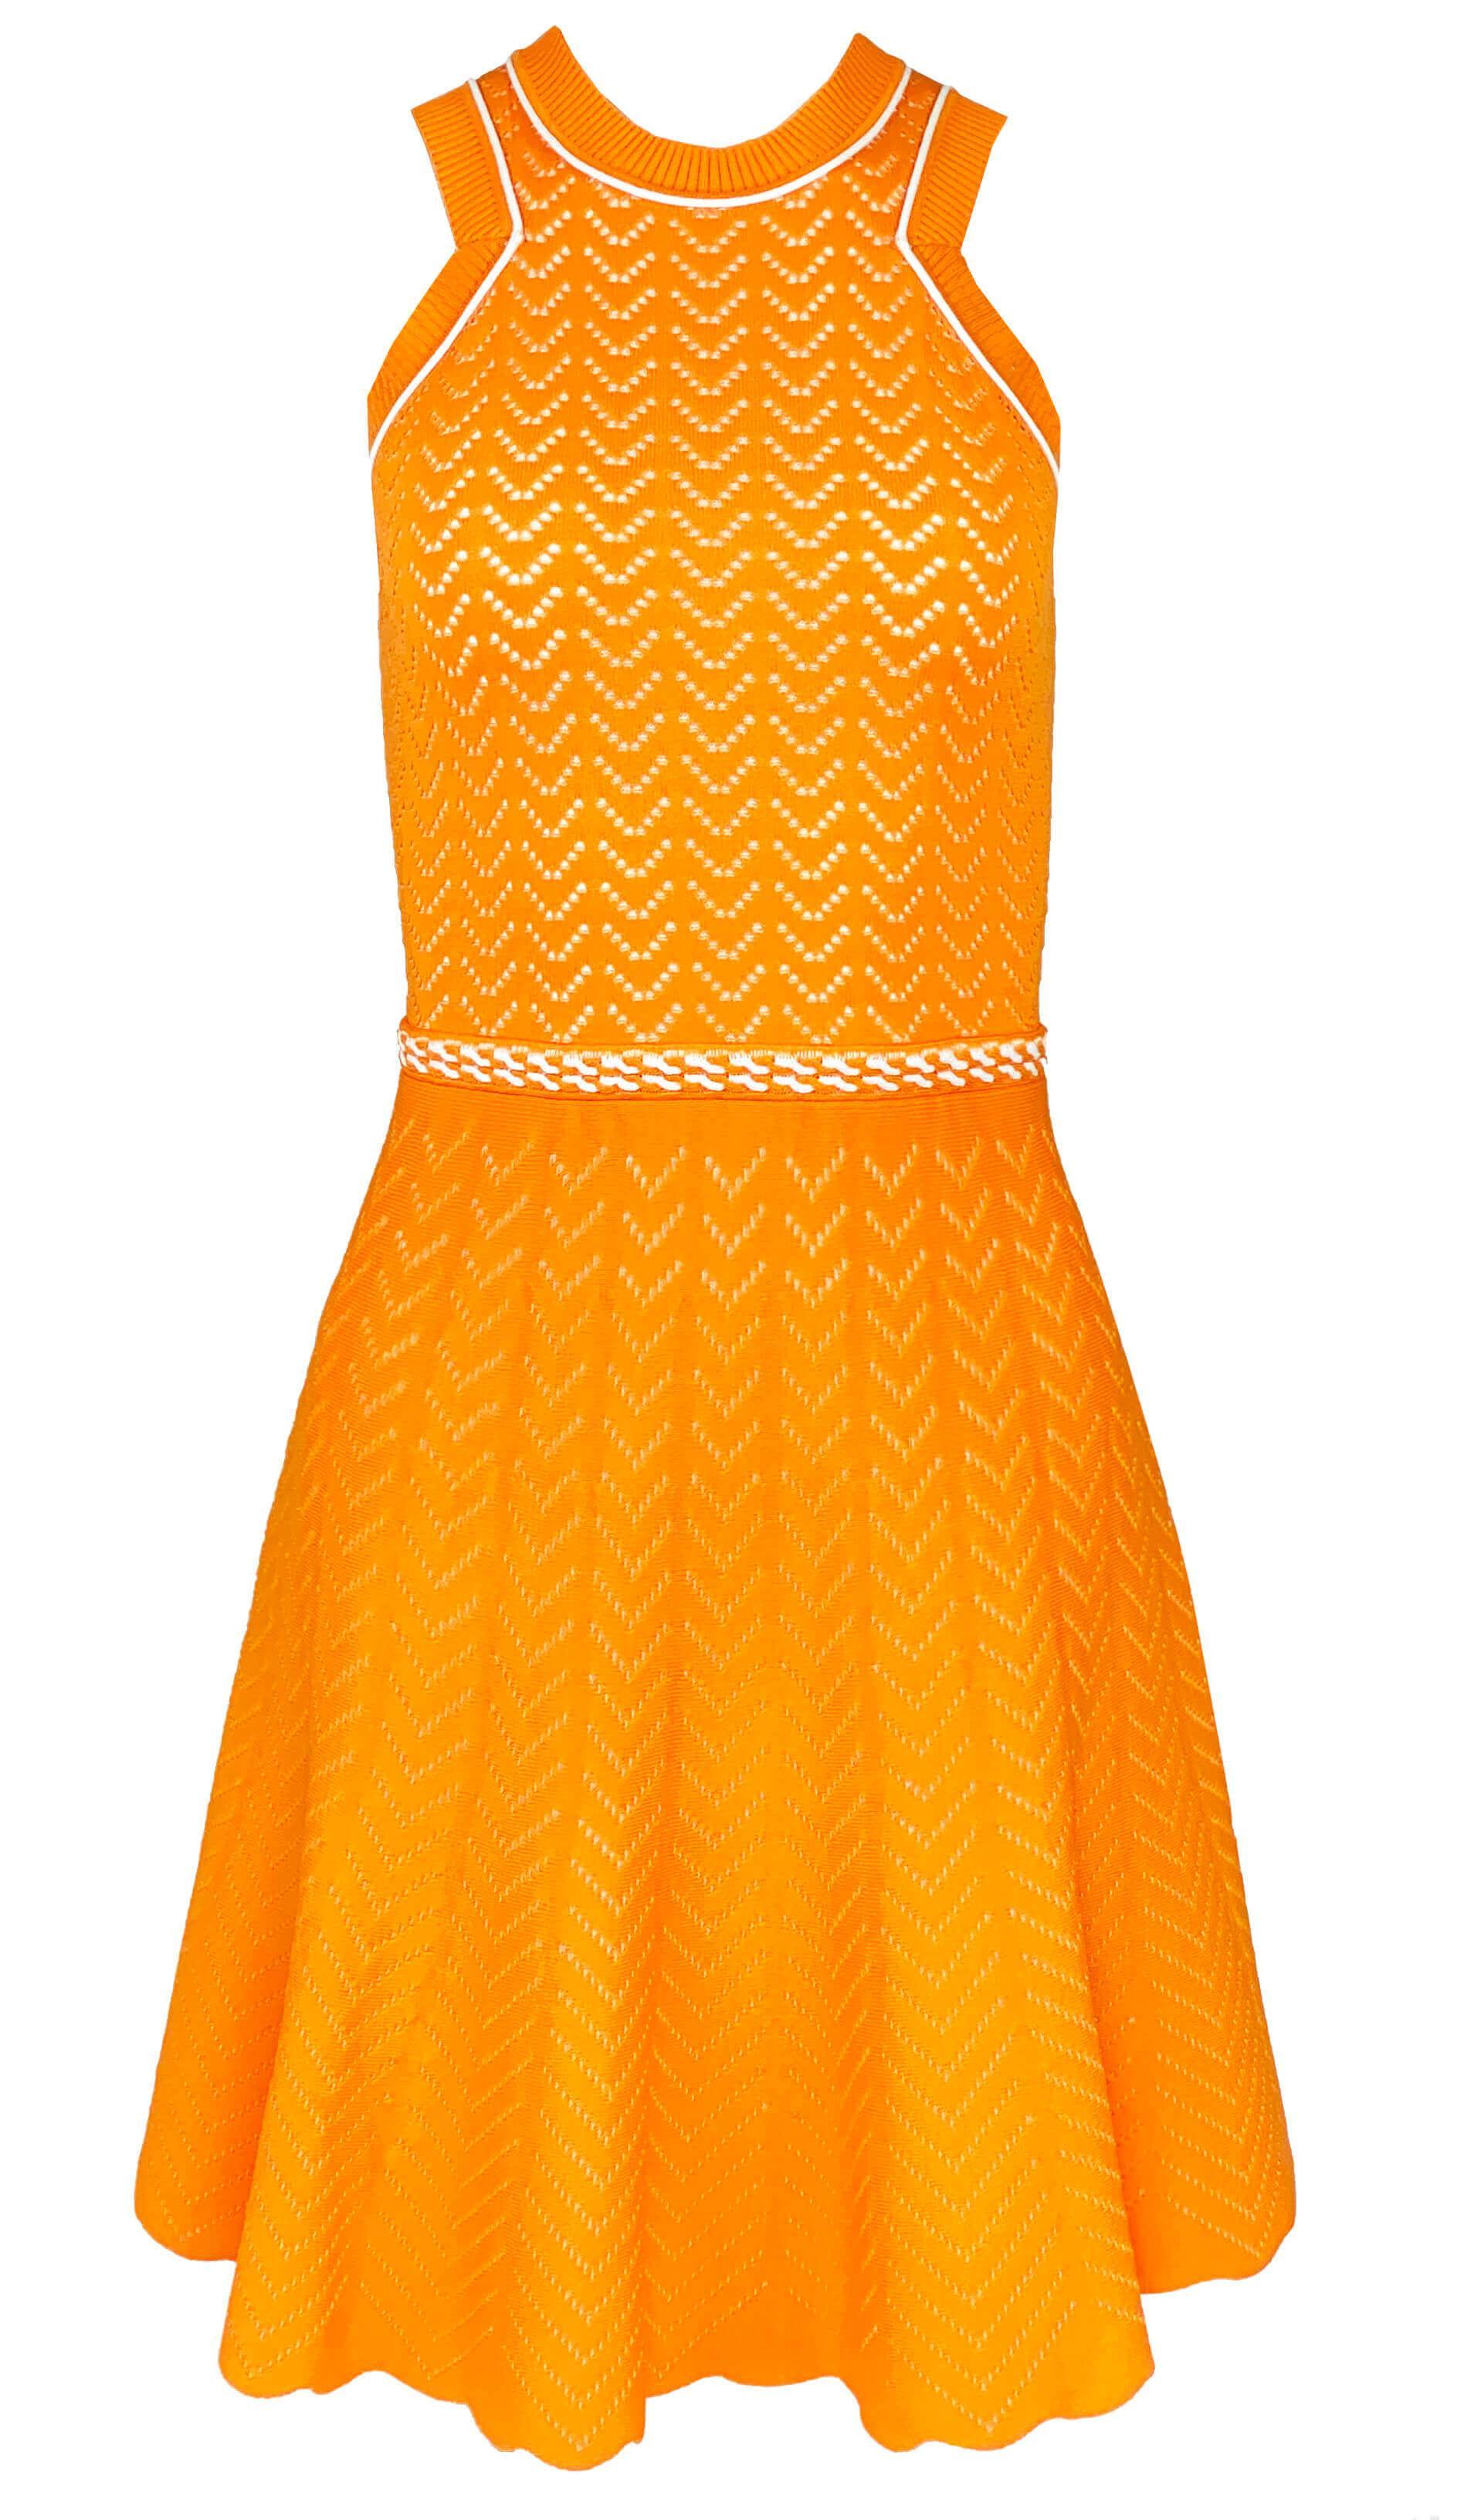 Marion Knit Dress